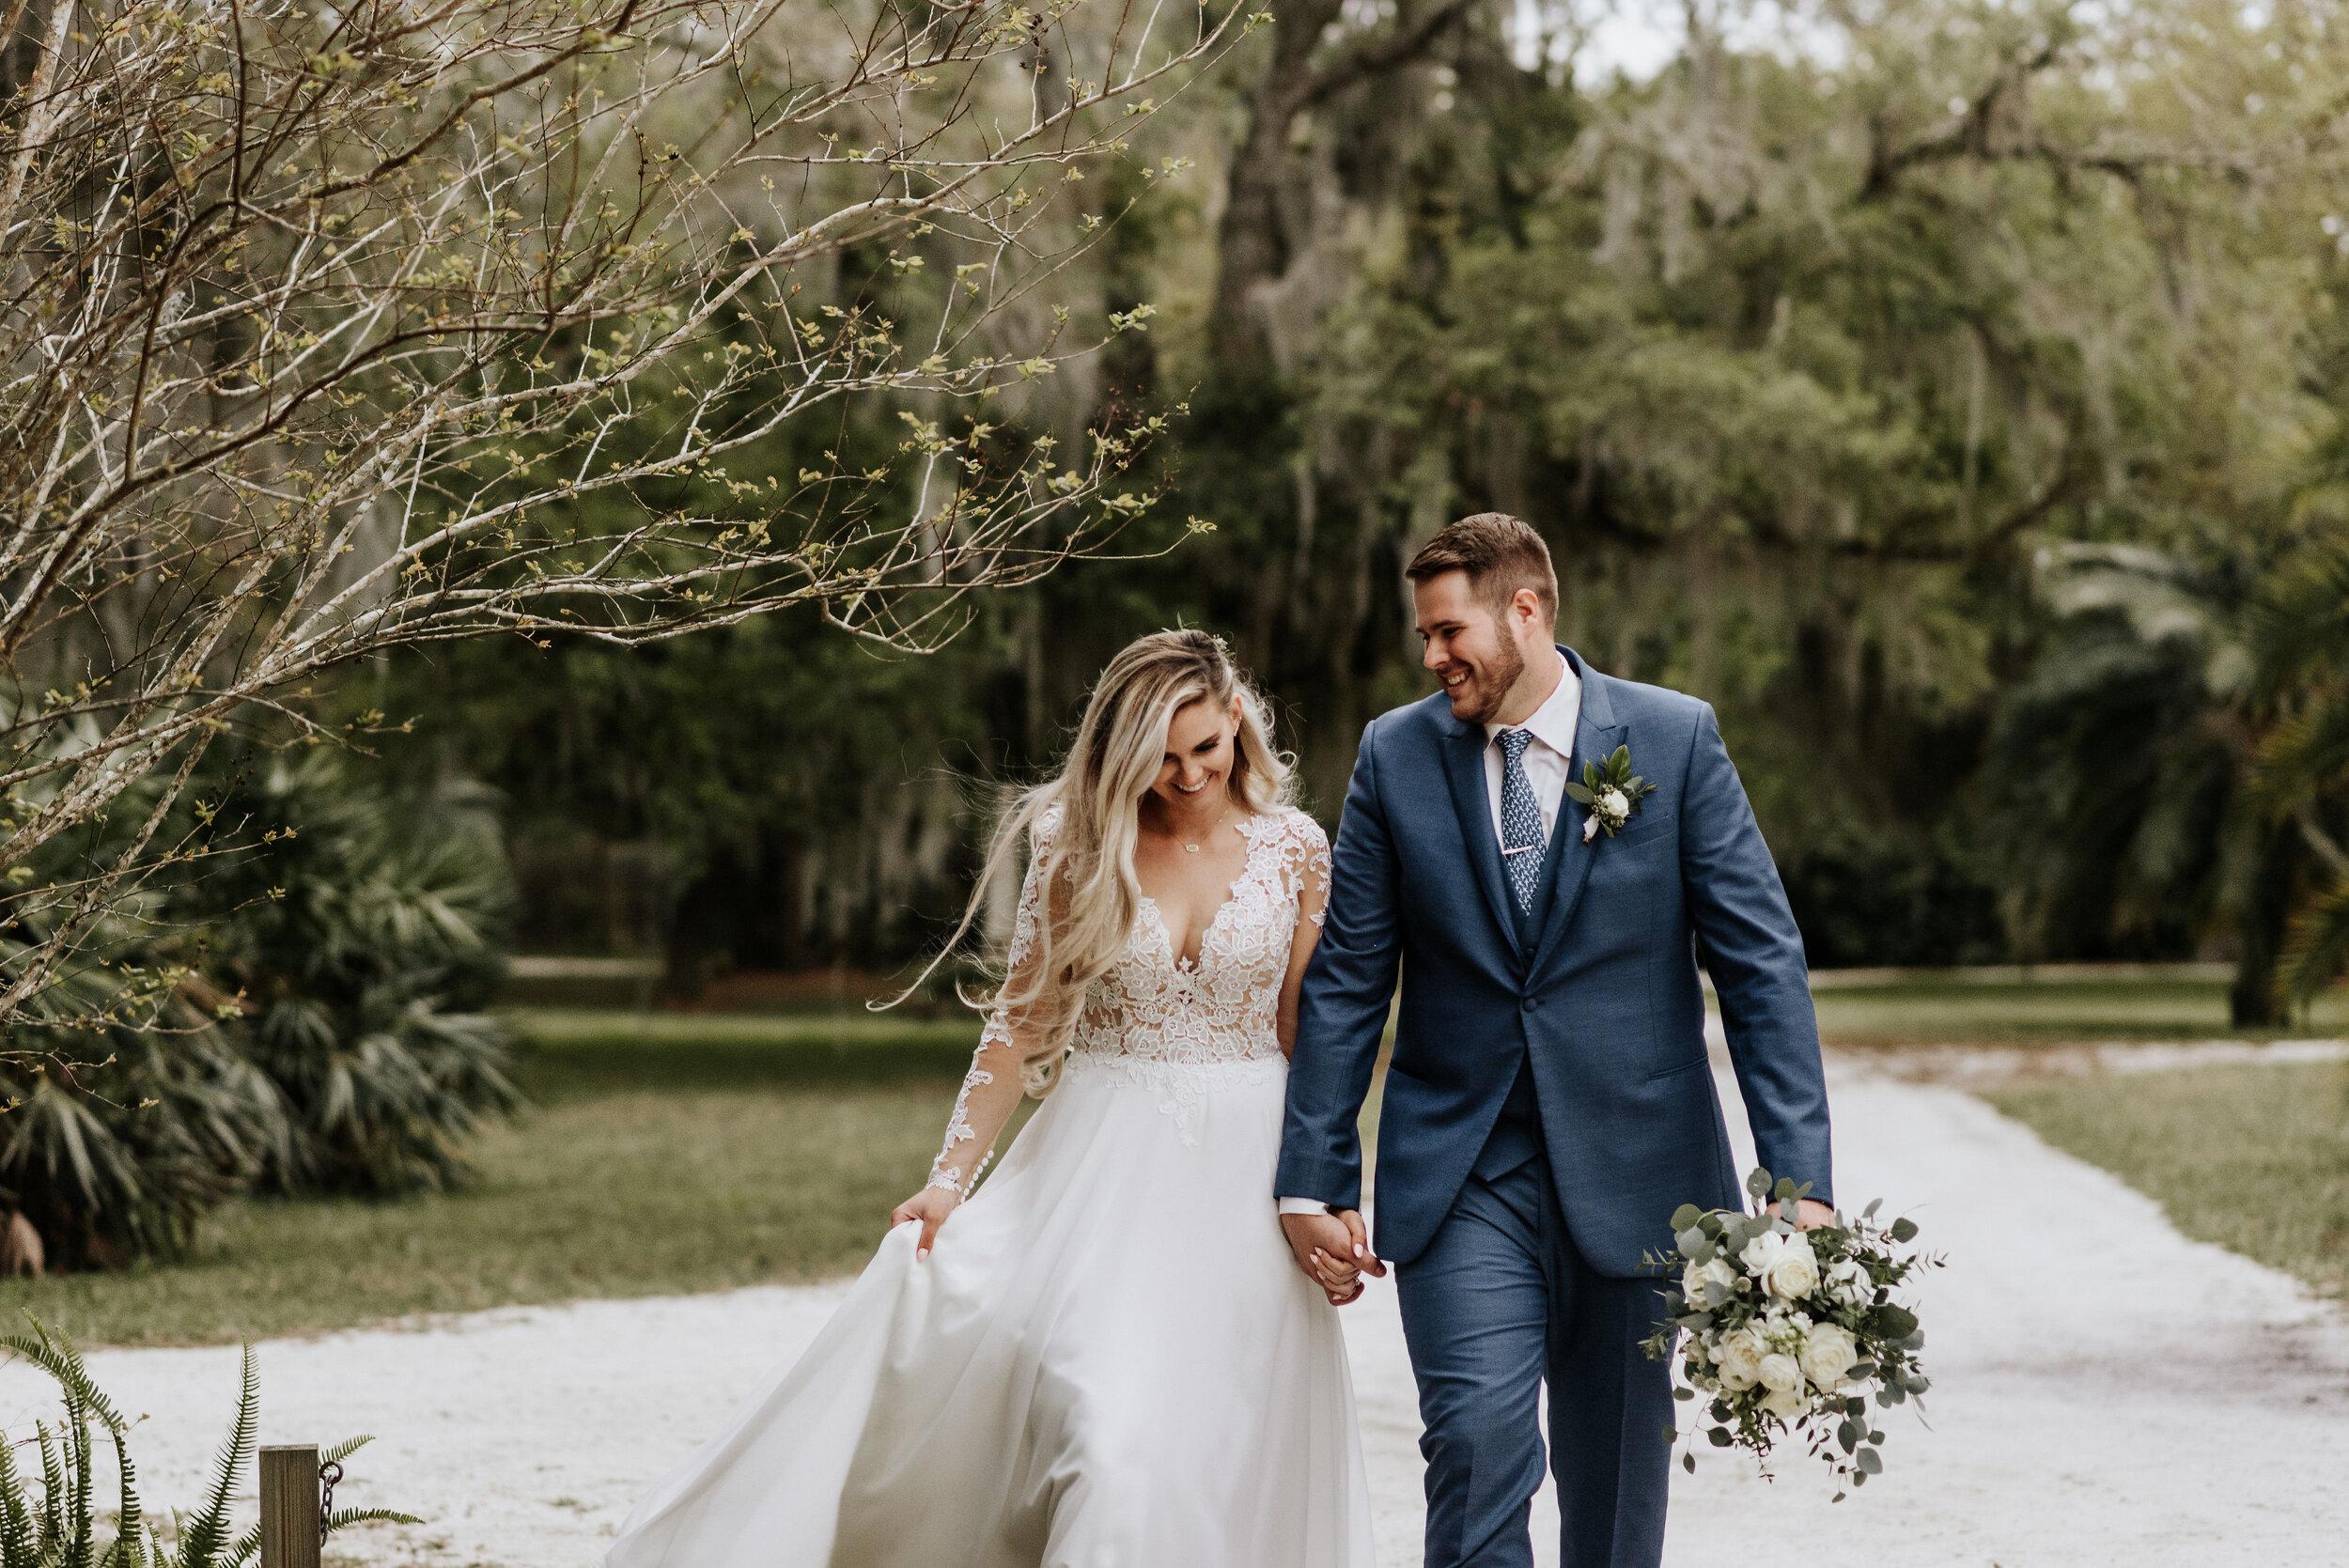 Mikenzi_Brad_Wedding_The_Delamater_House_New_Smyrna_Beach_Florida_Photography_by_V_5342.jpg